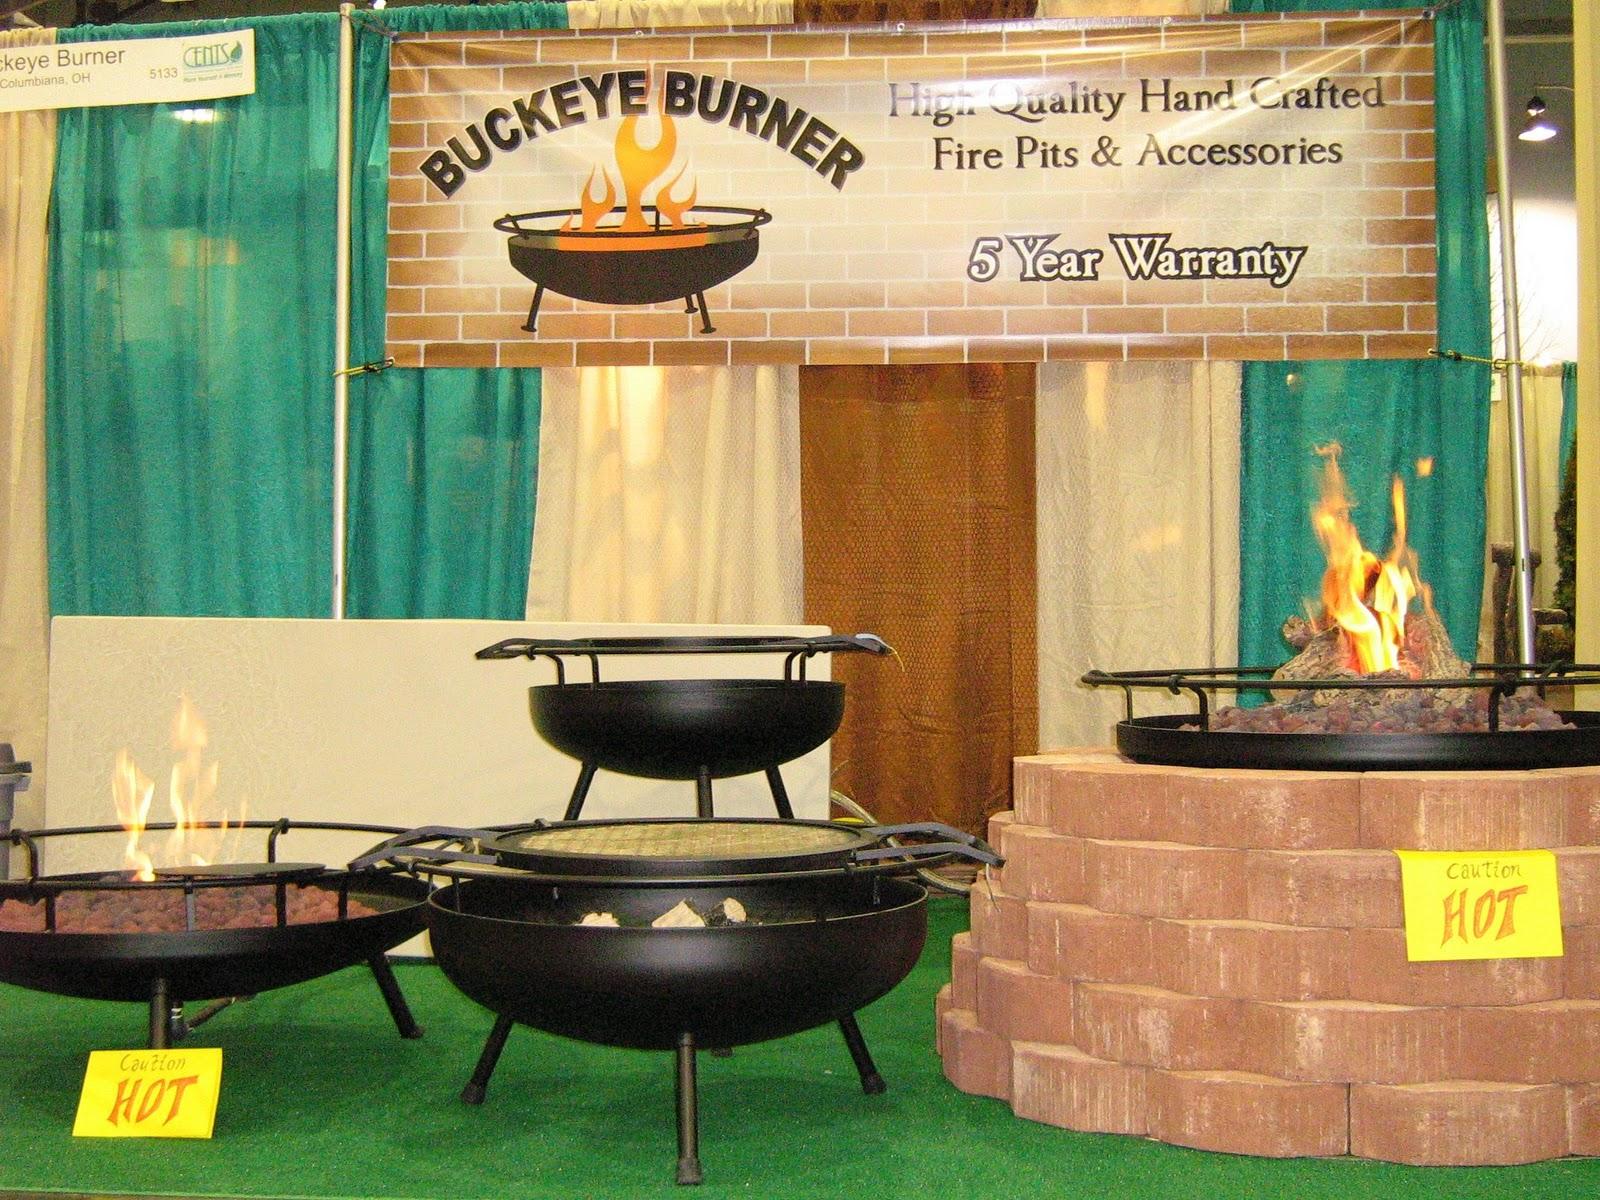 buckeye burner february 2011